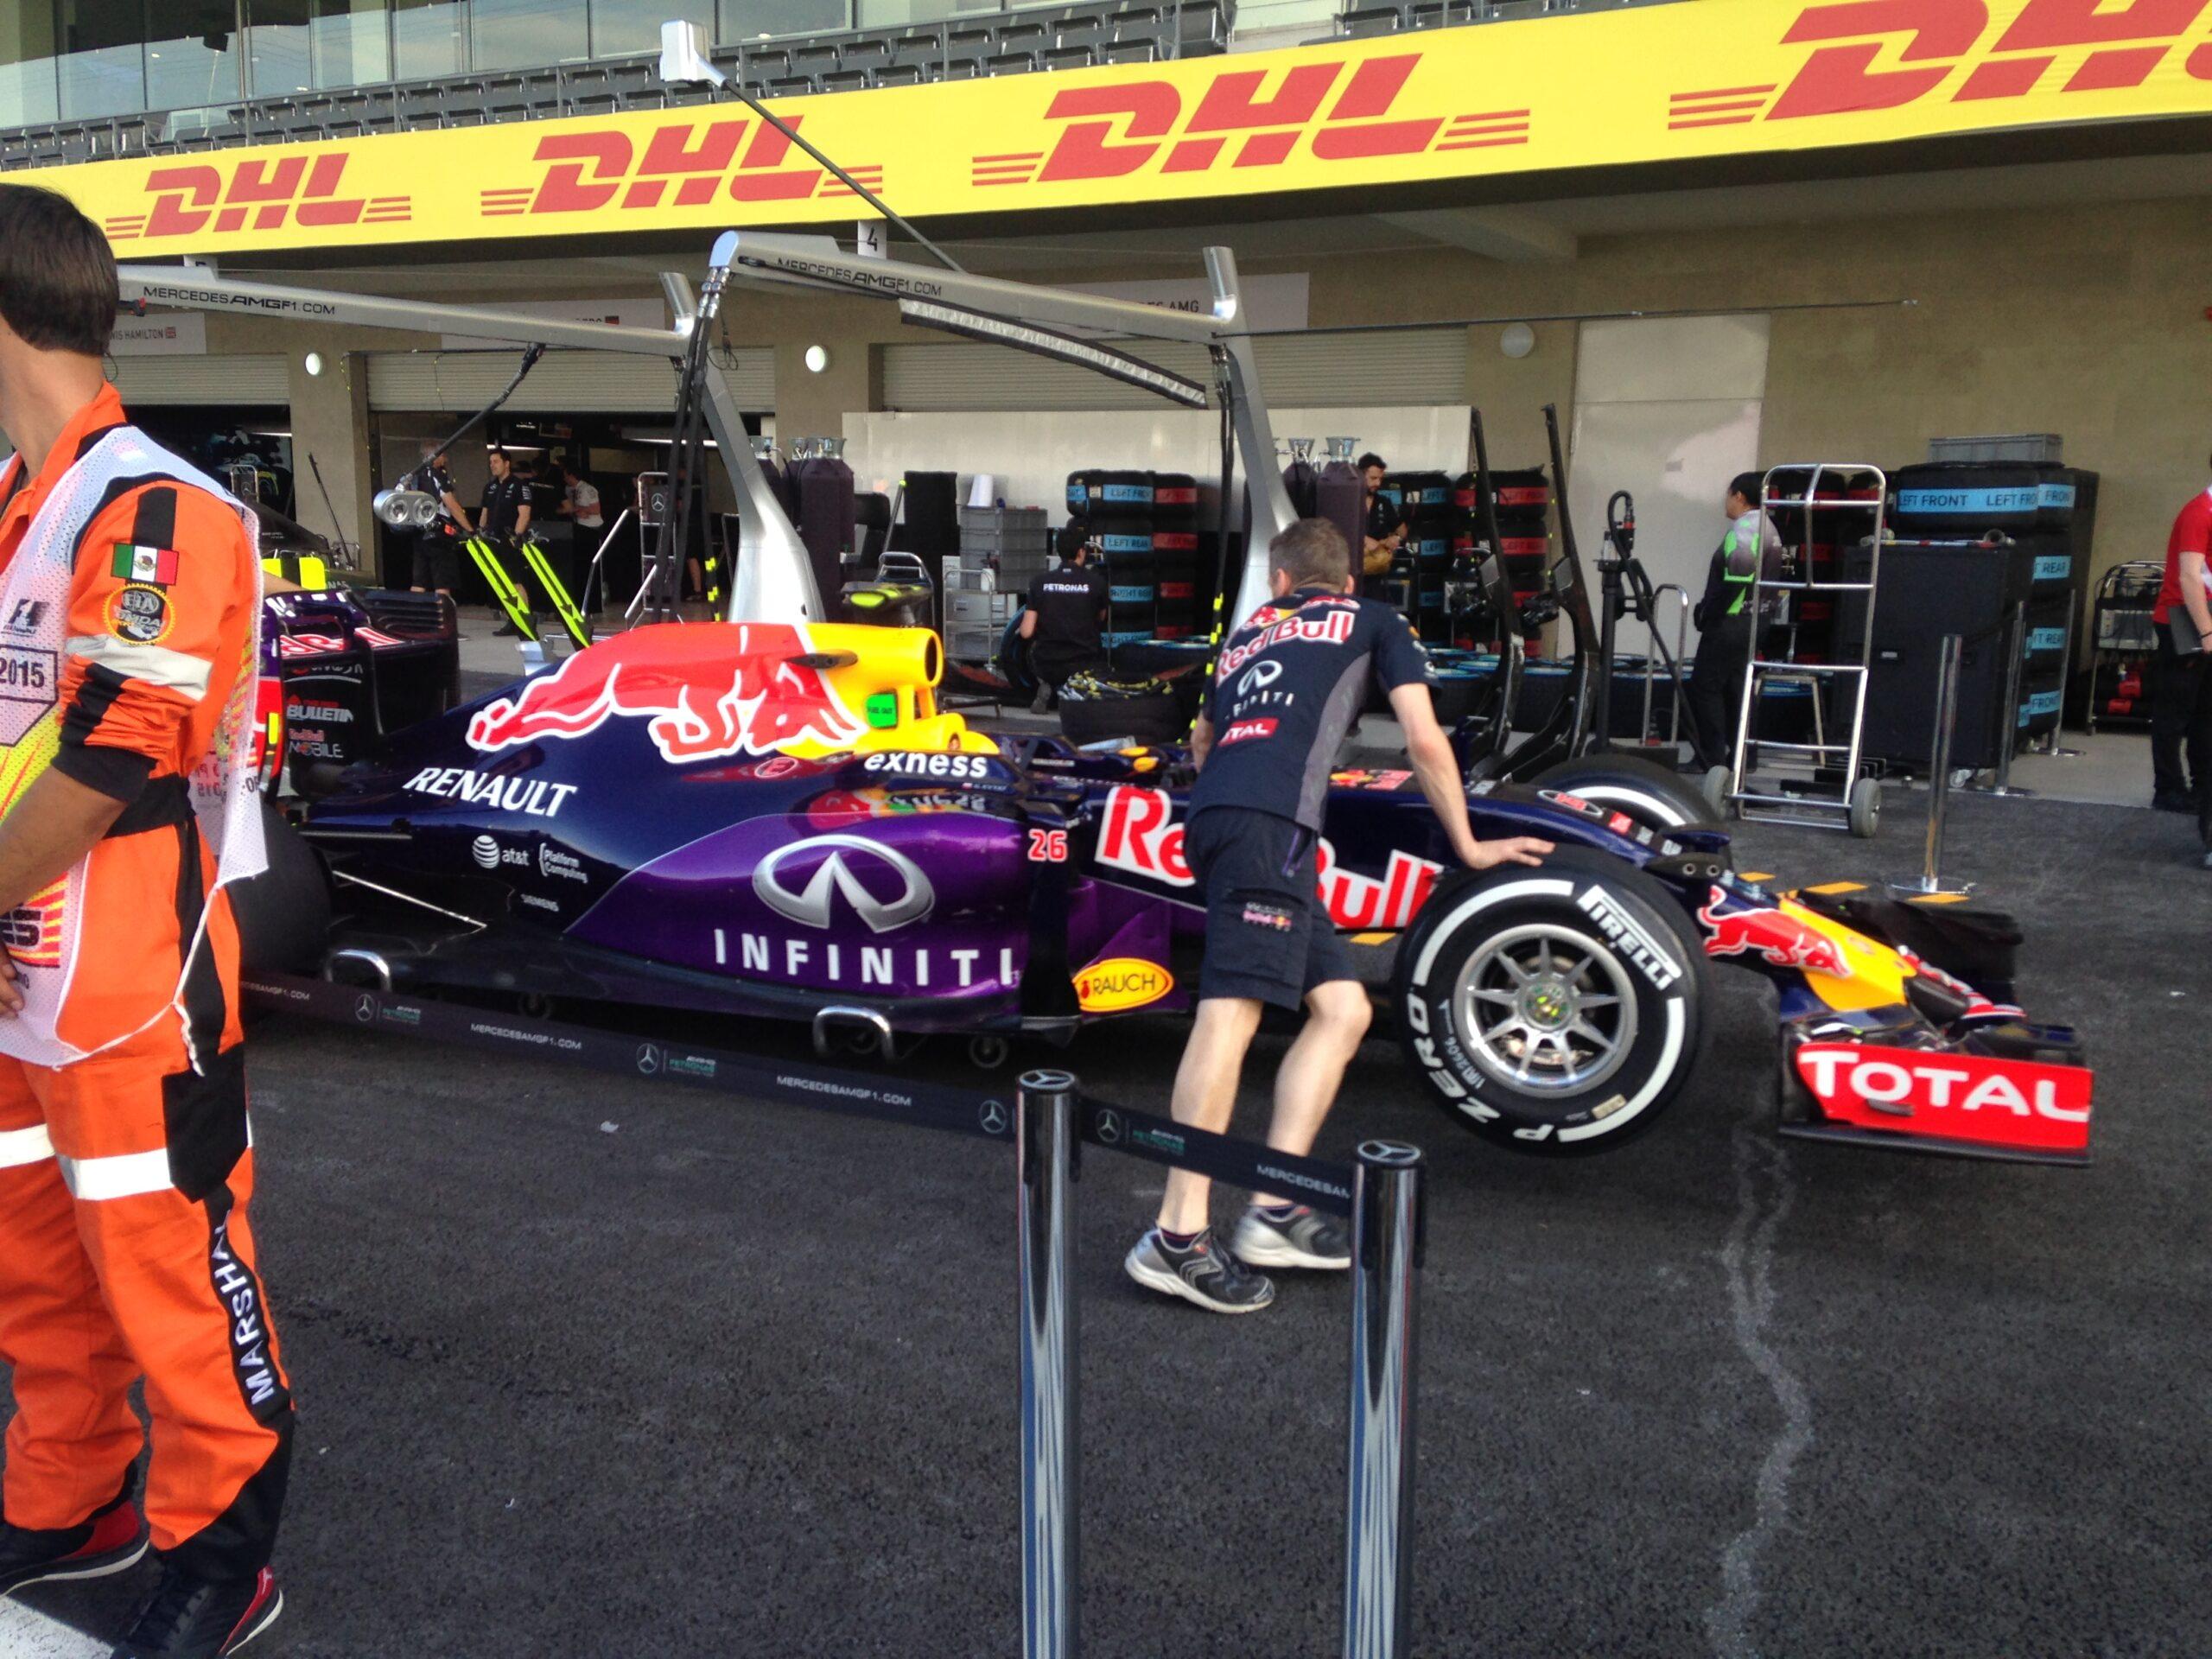 F1 Hongarije 2021 – Red Bull Racing Paddock Club ™ Hospitality